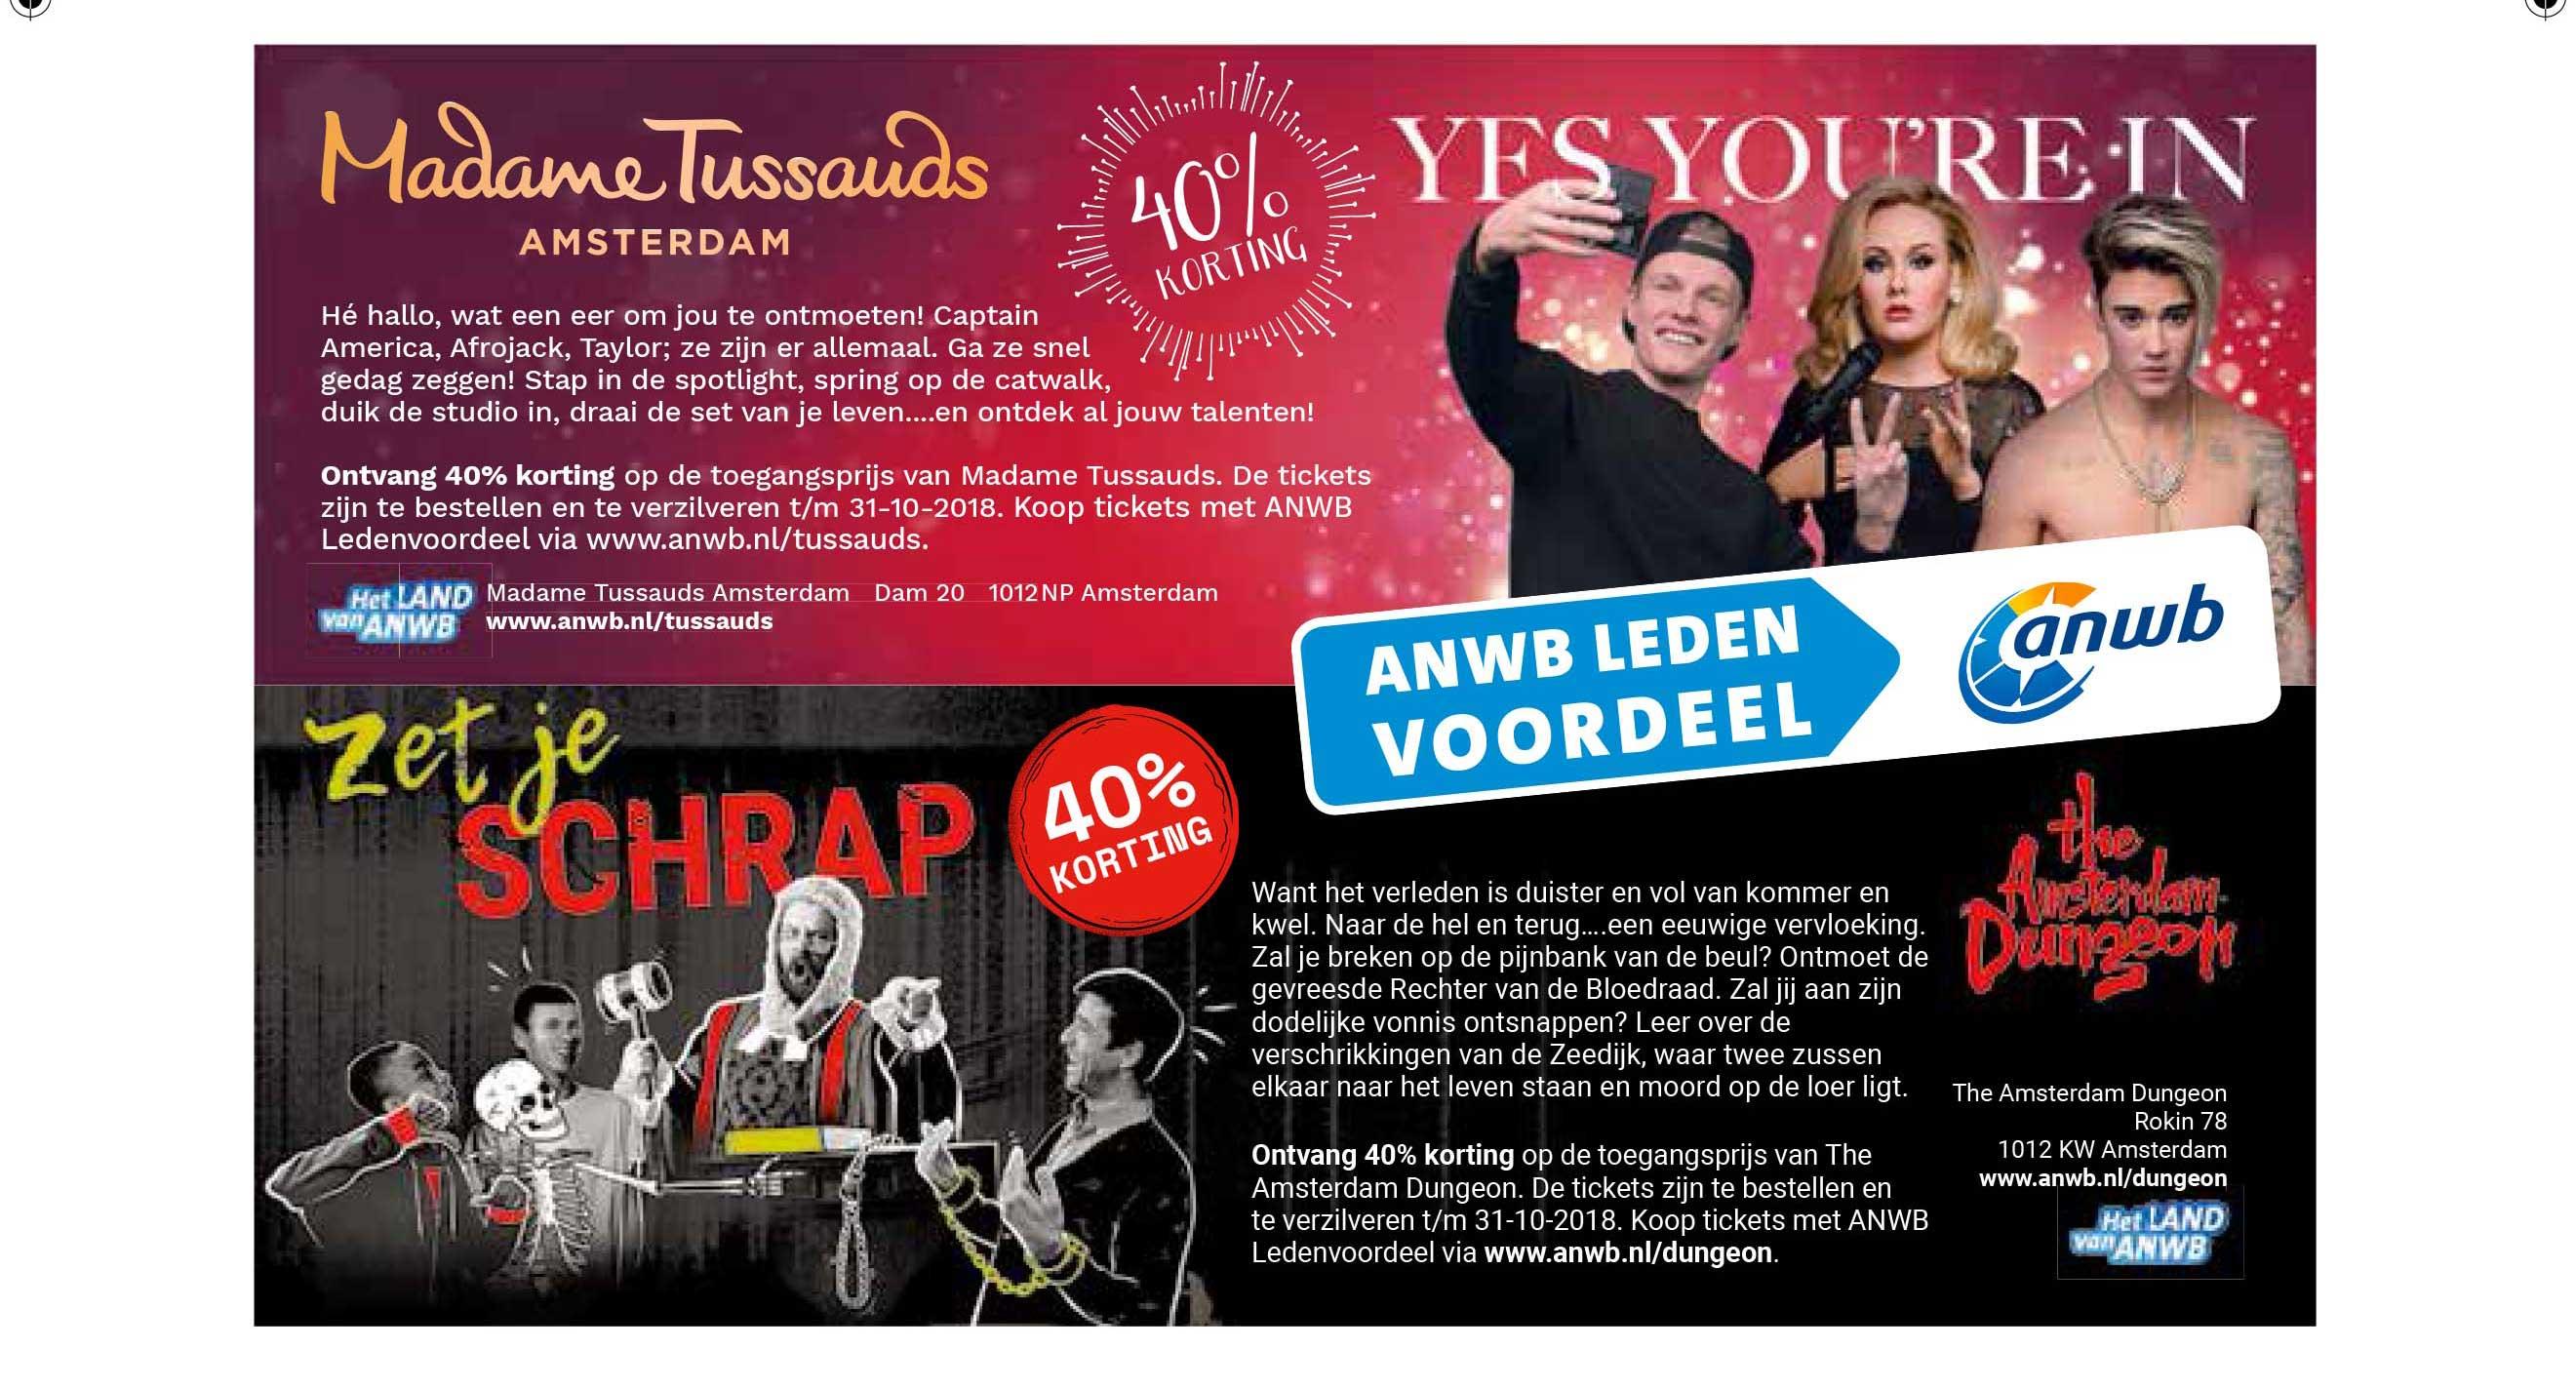 ANWB Madame Tussauds: 40% Korting